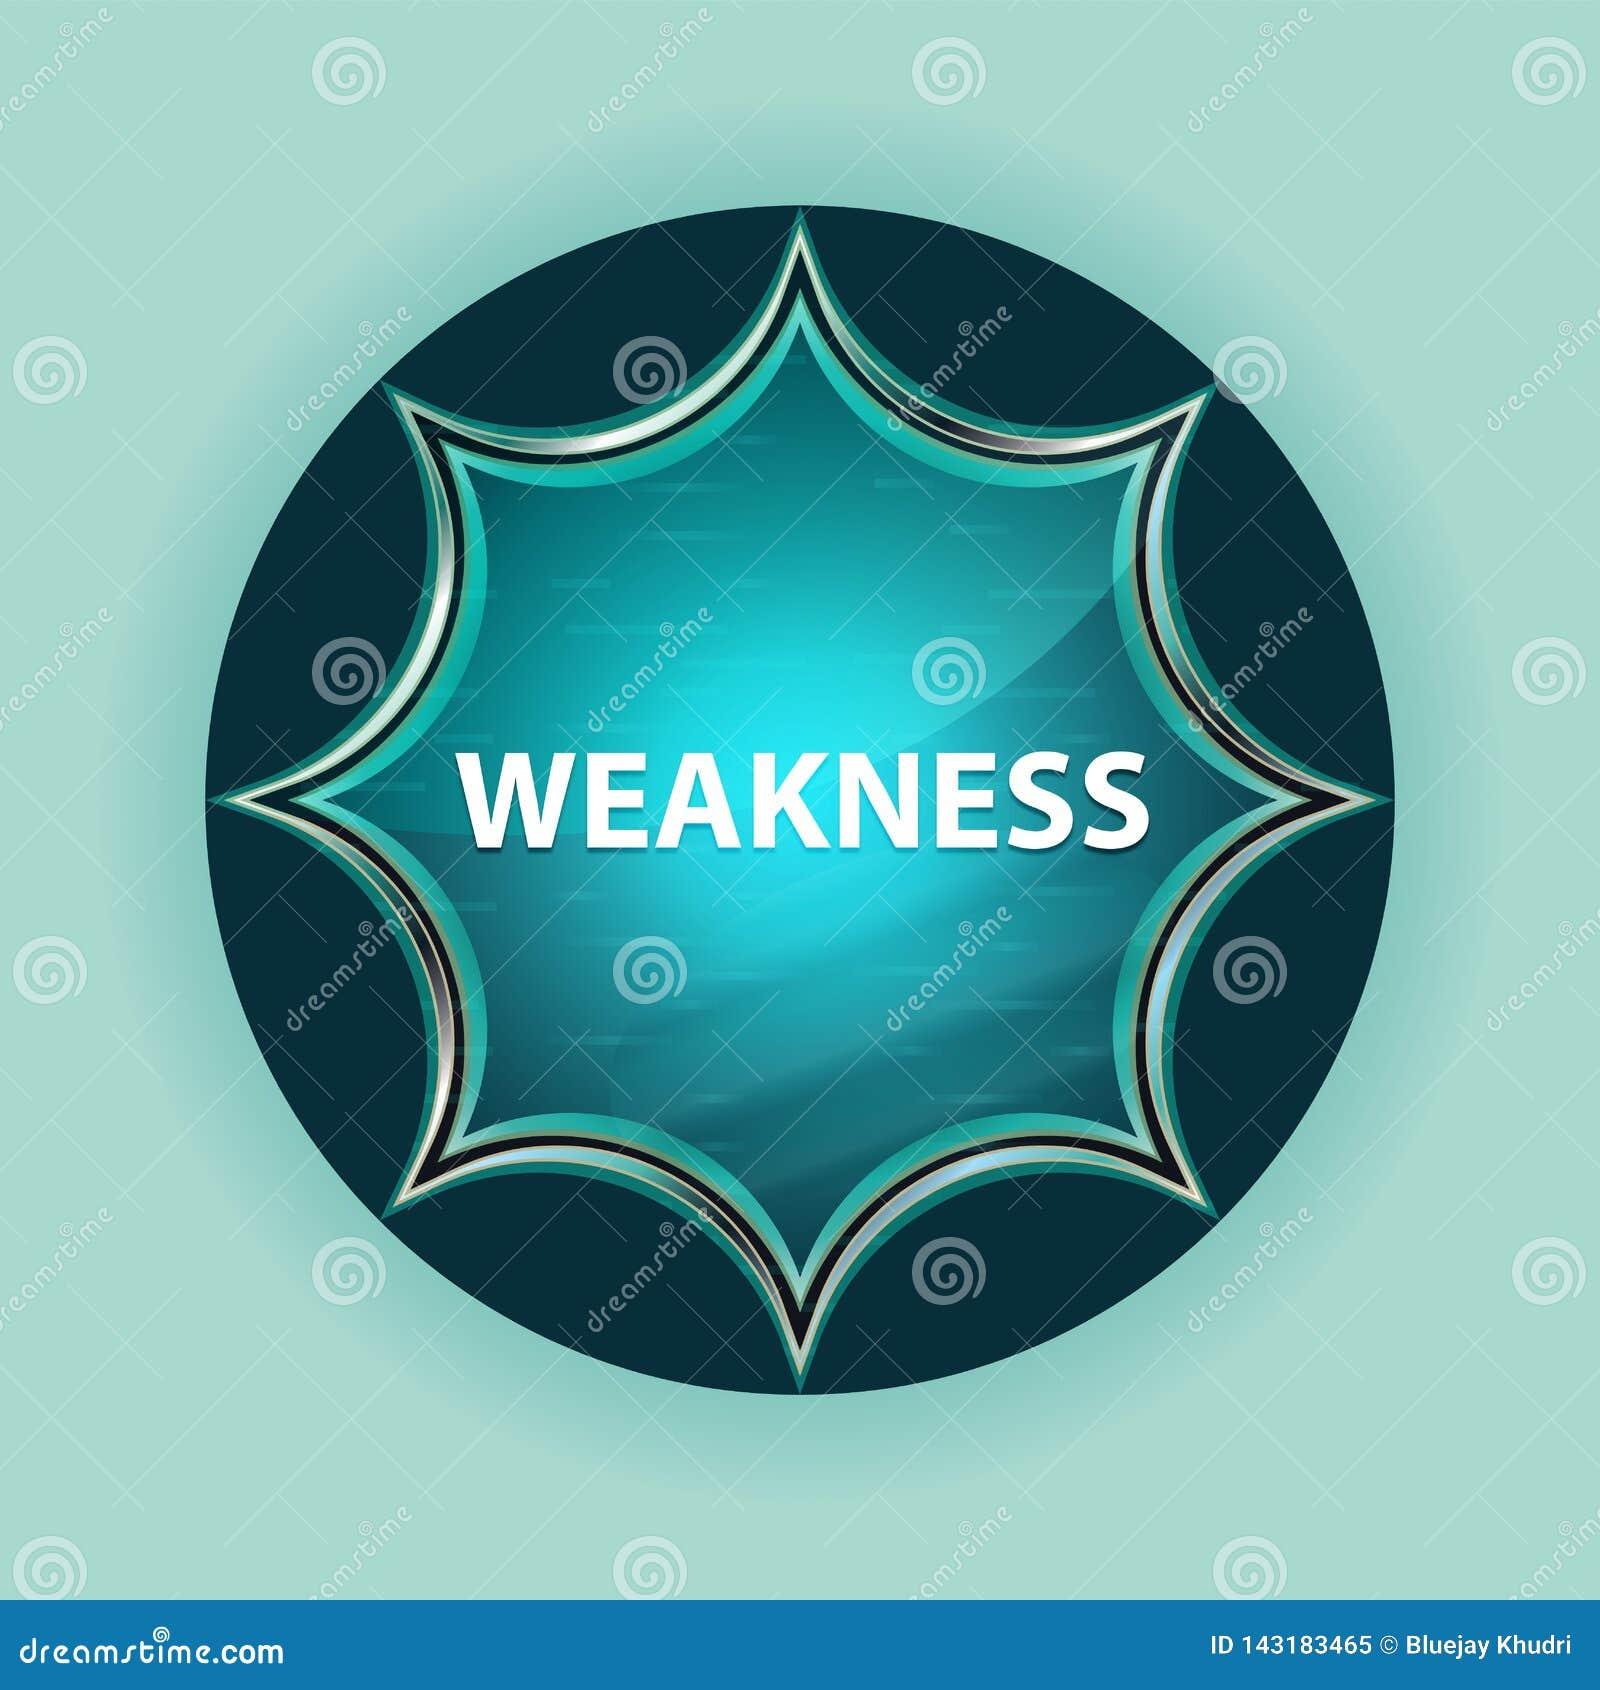 Weakness magical glassy sunburst blue button sky blue background